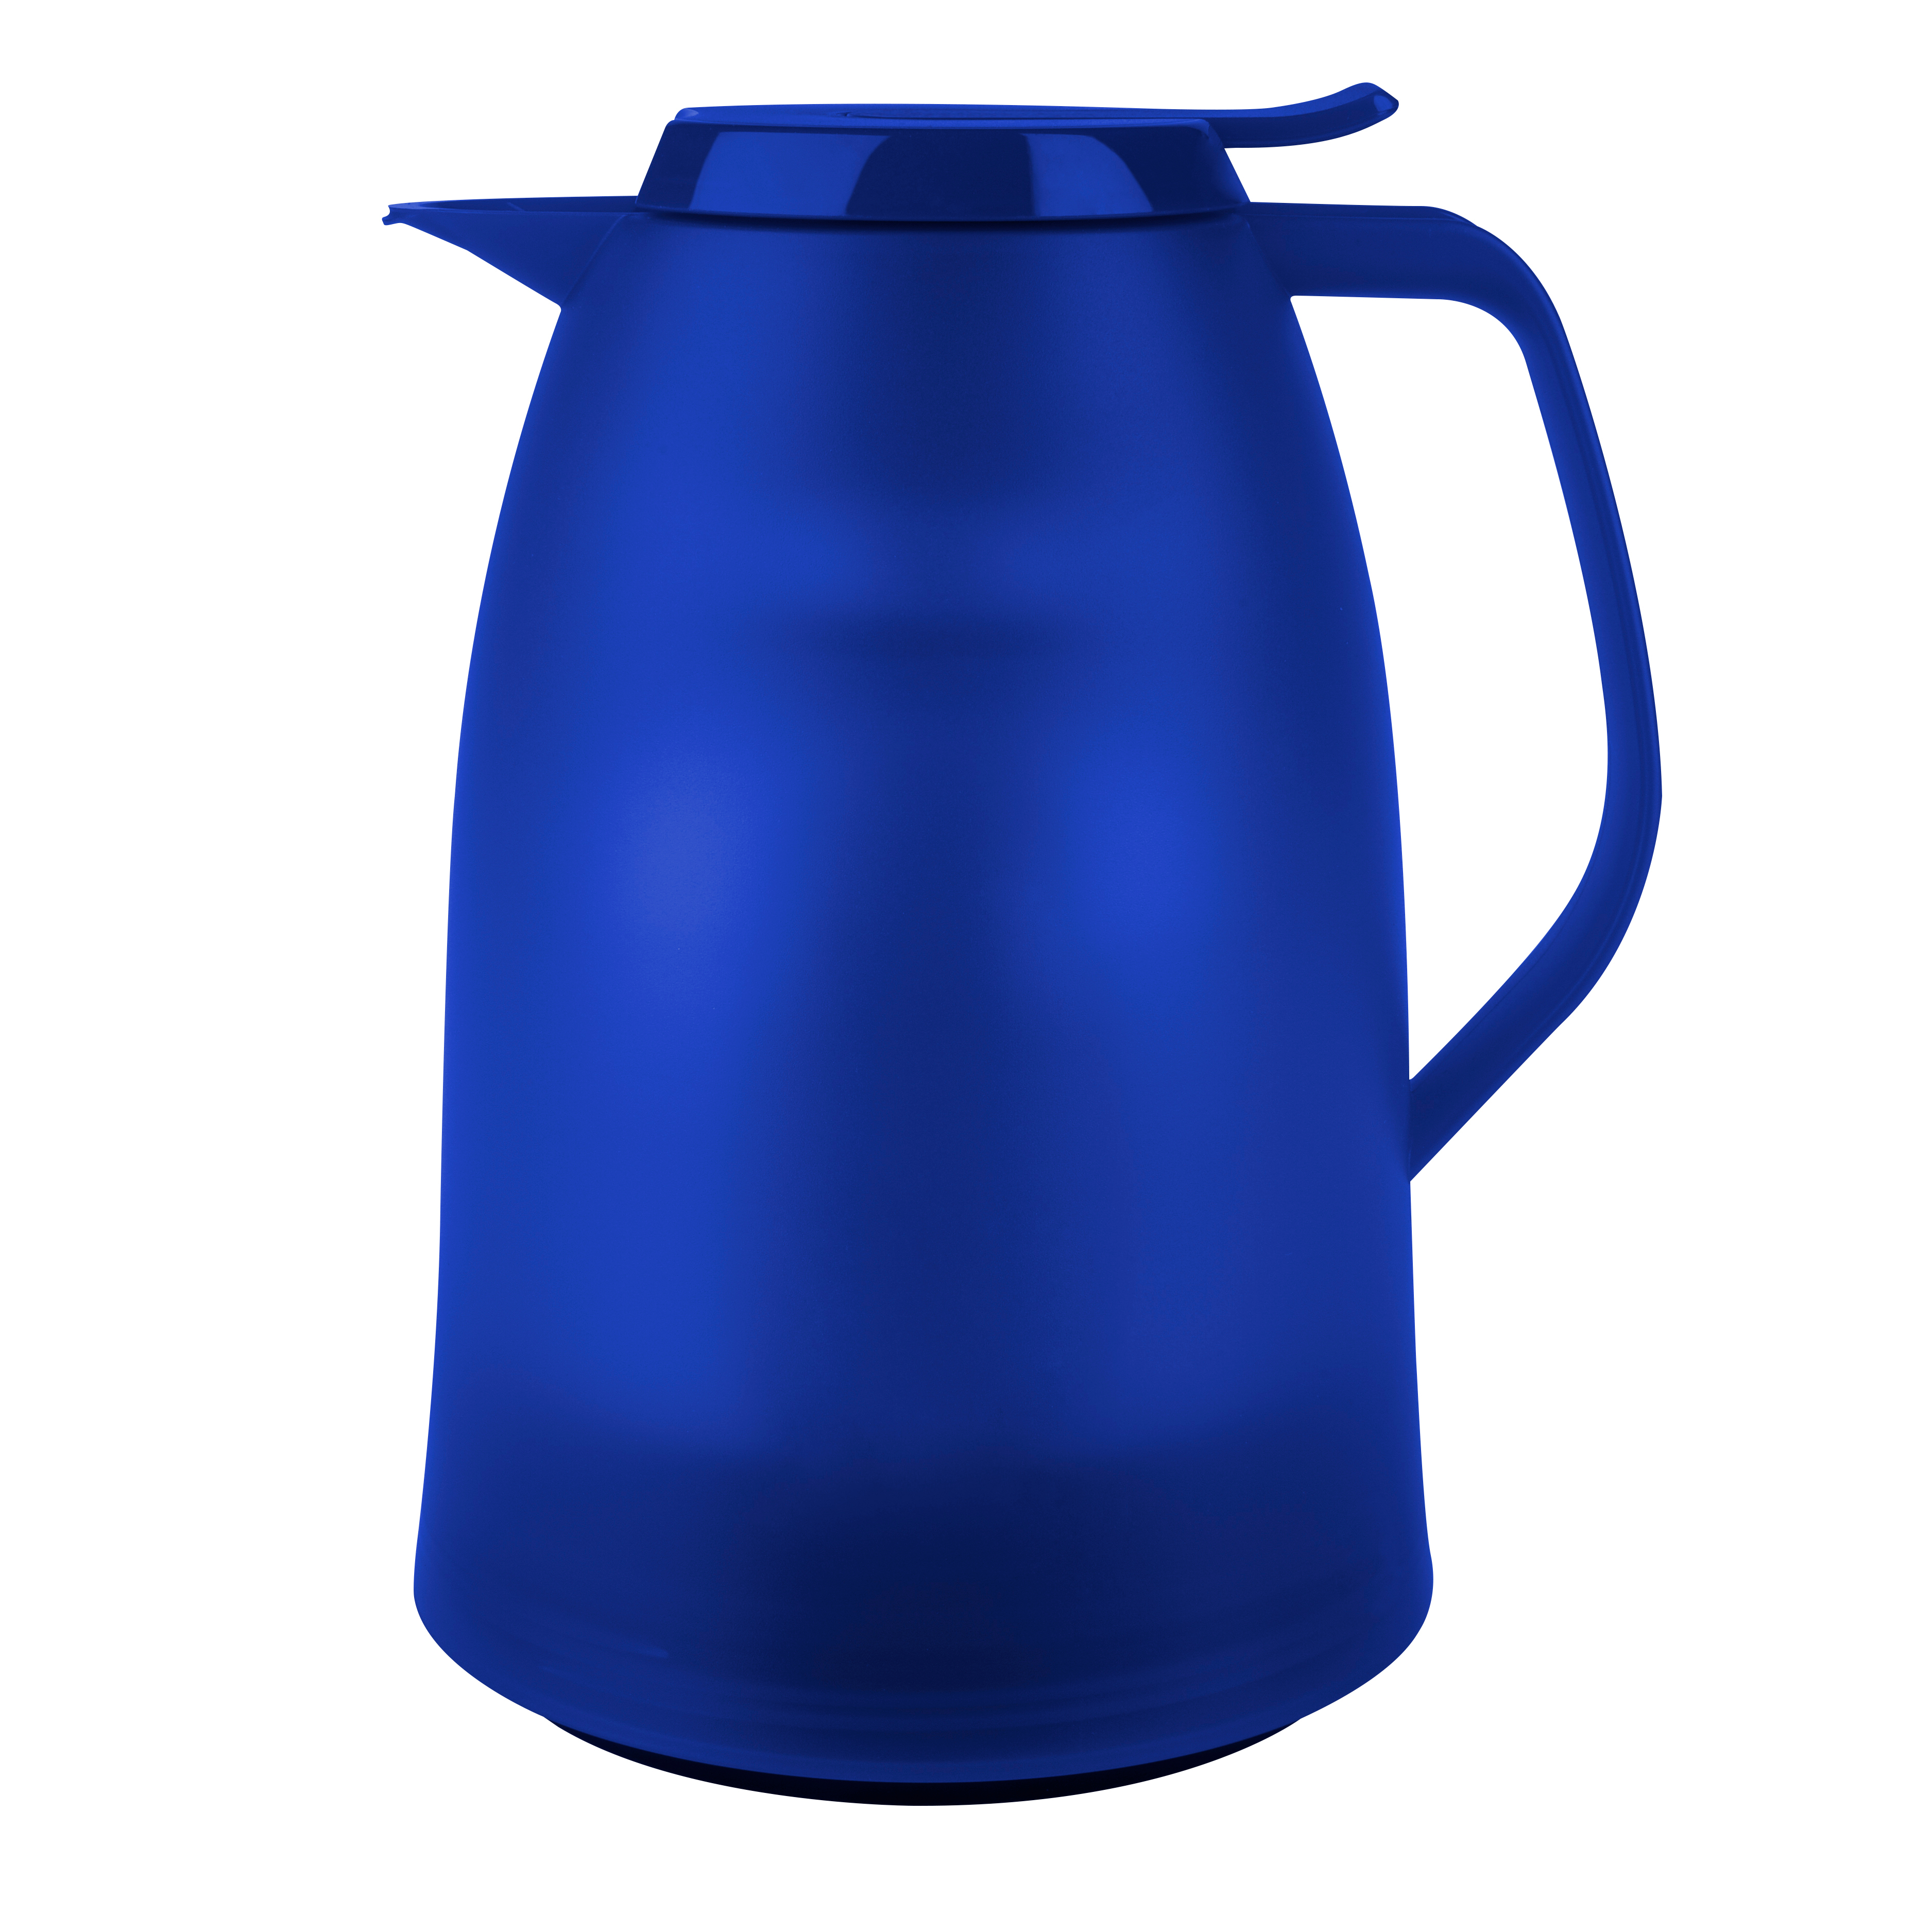 EMSA 514506 MAMBO Isolierkanne 1,0L Blau transluzent - made in Germany - 100 % dicht - hält 12h heiß